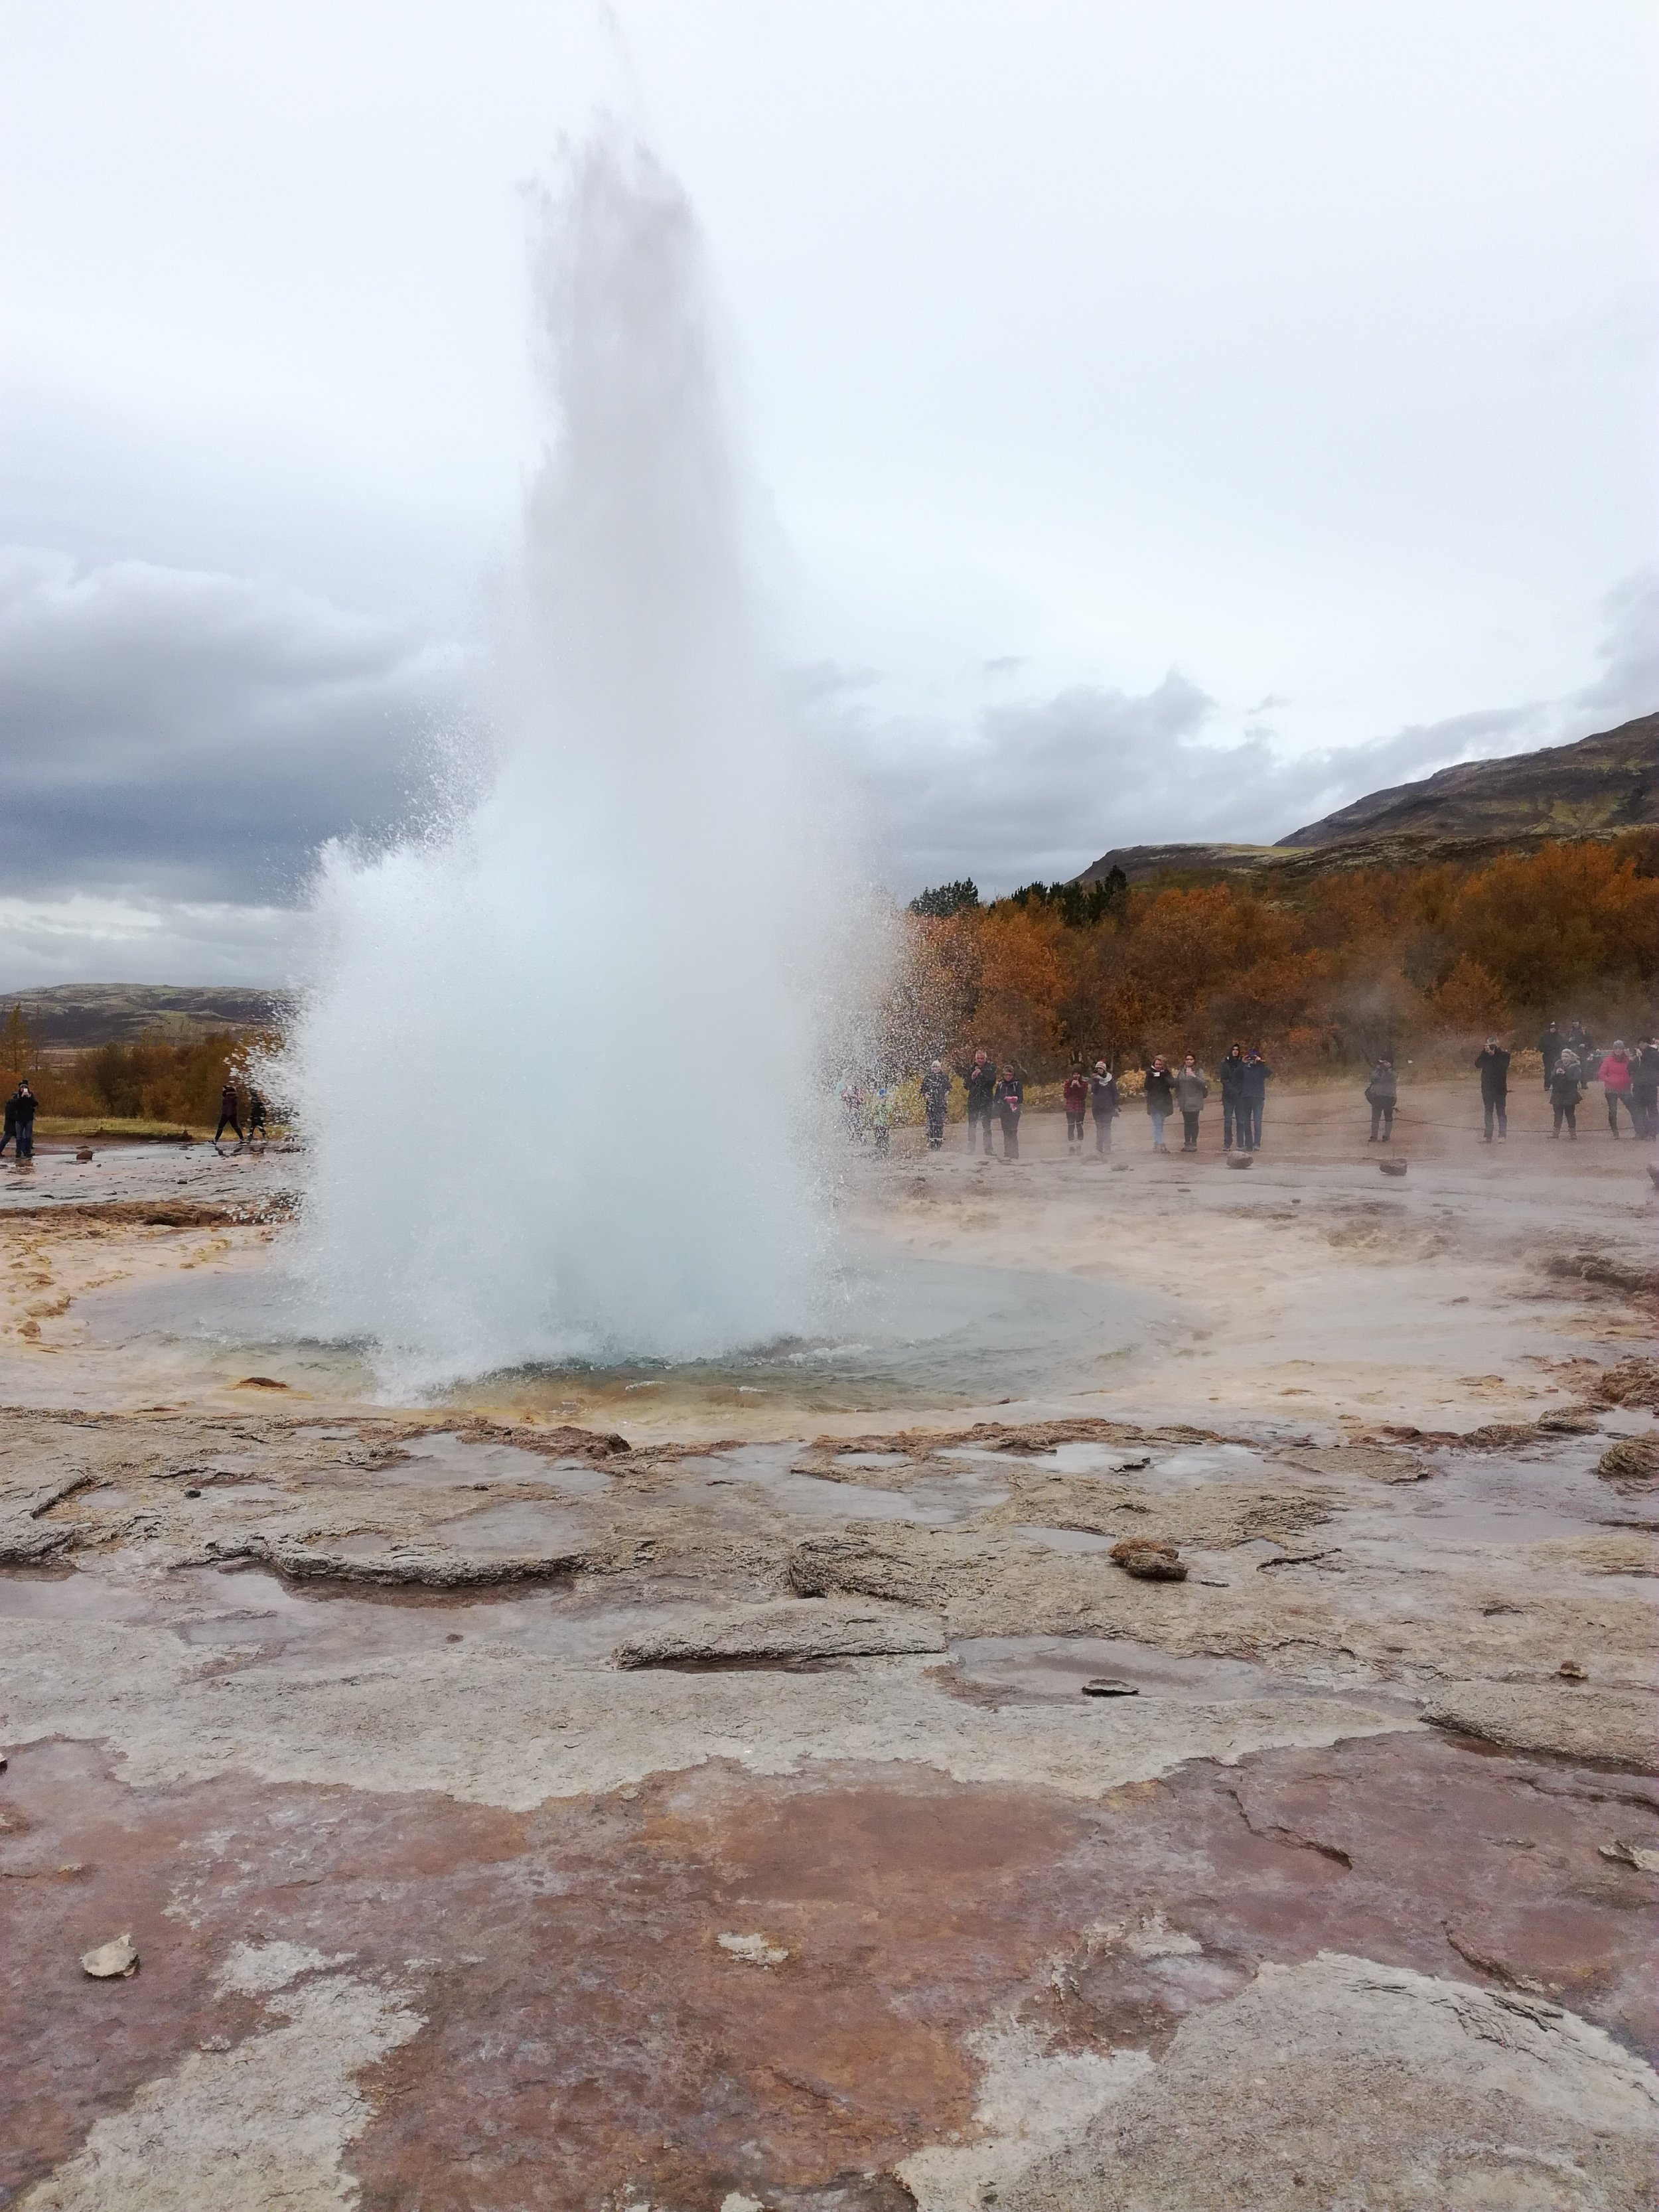 Strokkur Geyser at Haukadalur geothermal area